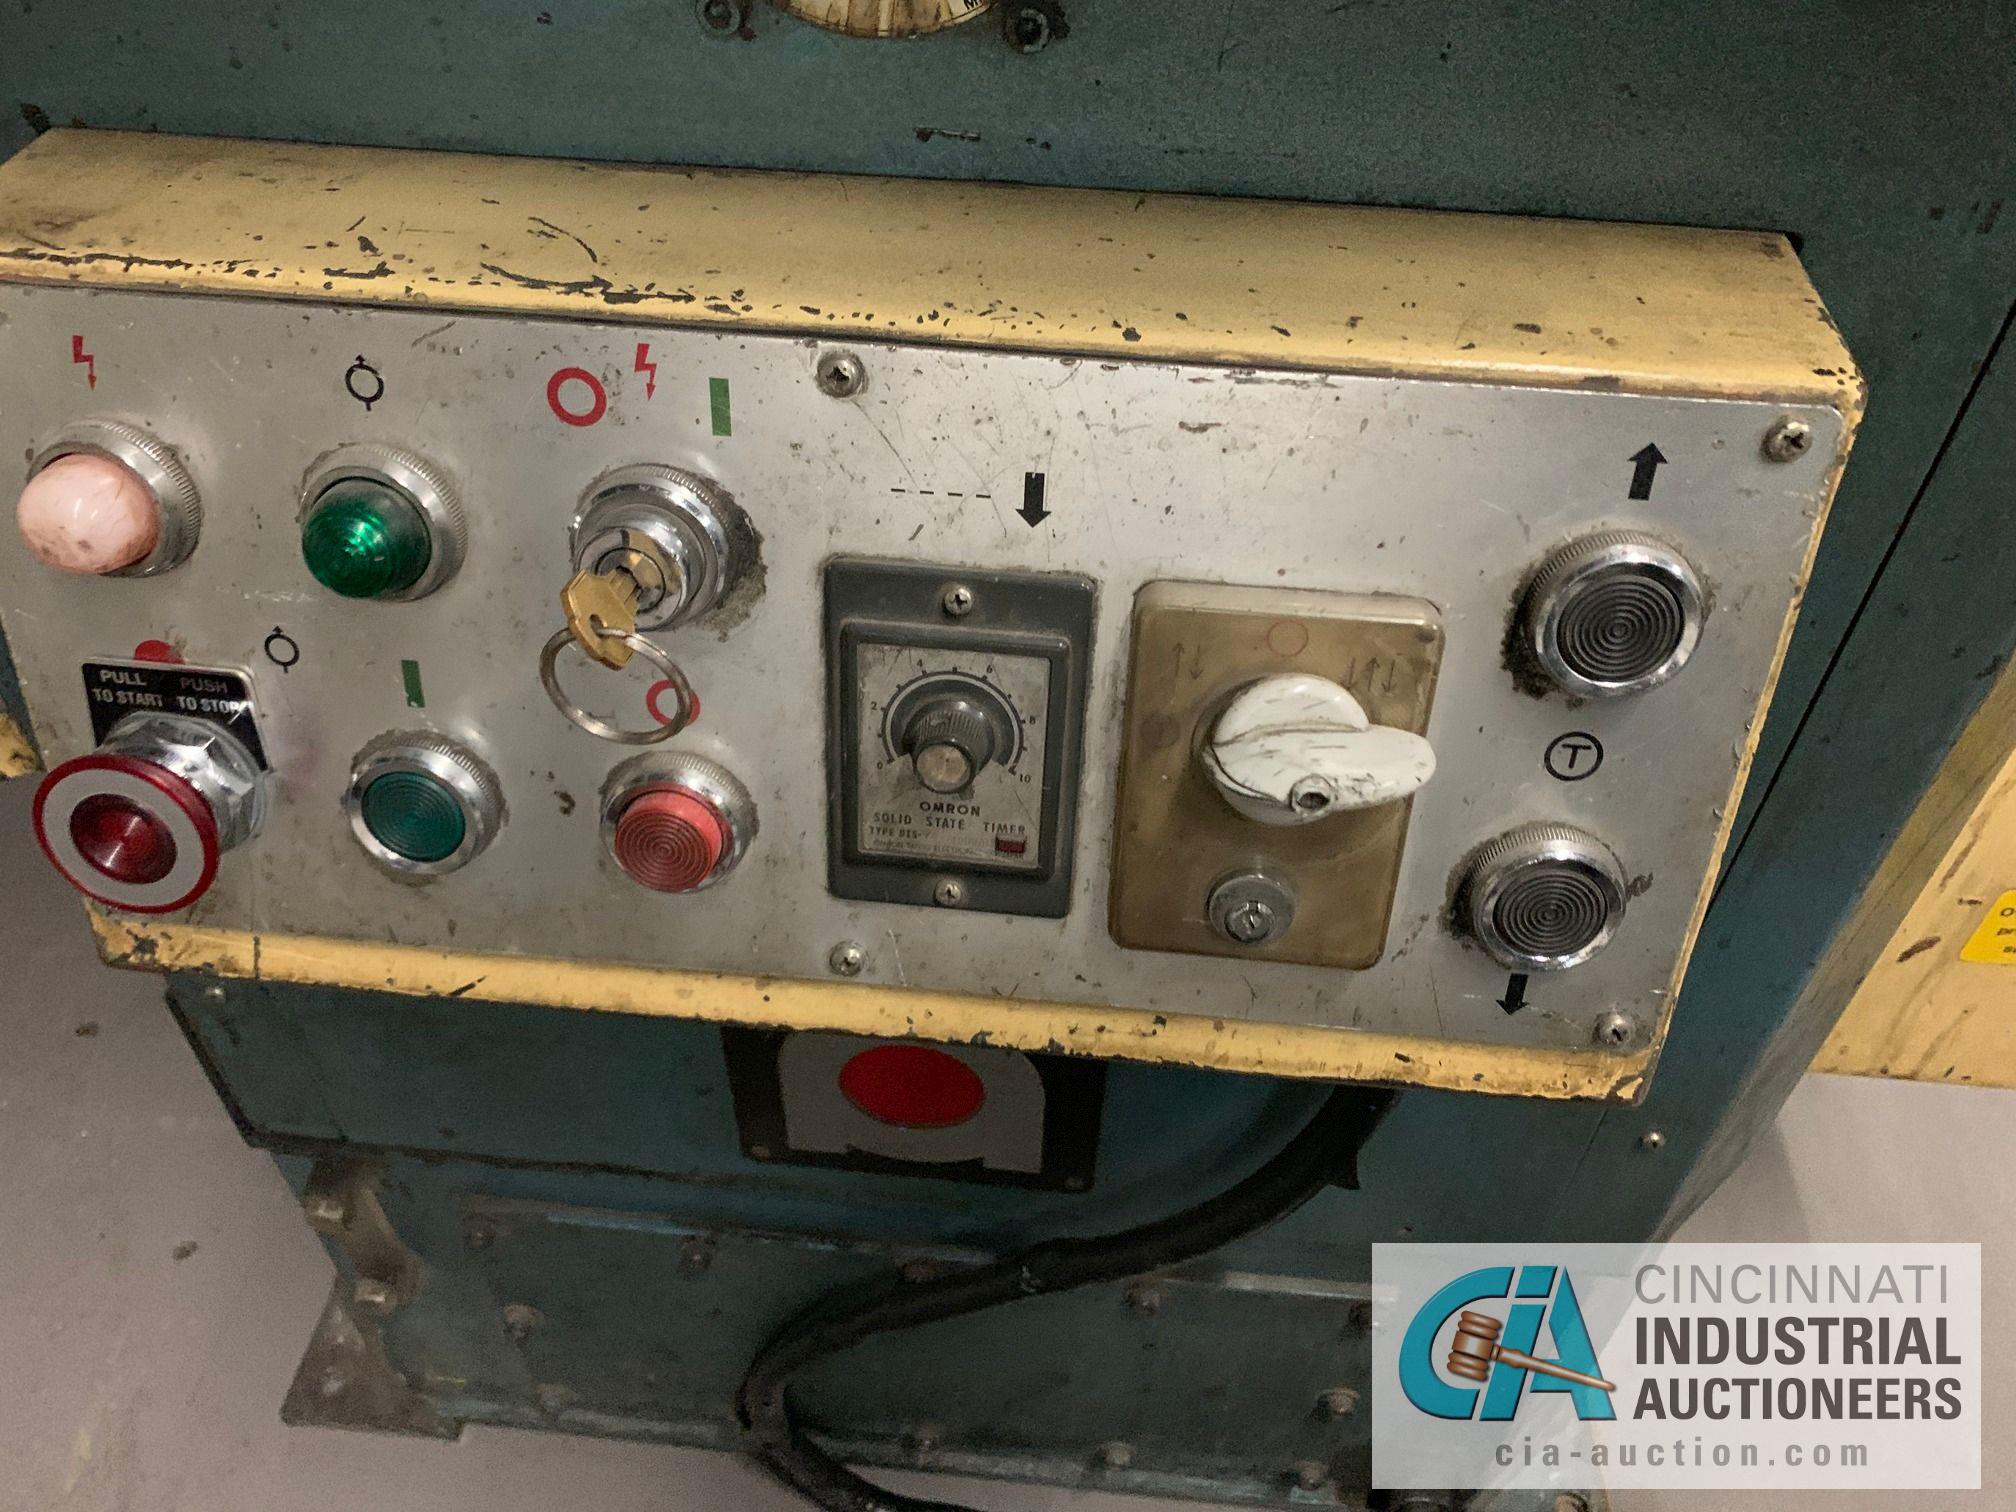 "9"" X 9"" AMADA CS-220 HYDRAULIC NOTCHER; S/N S44278, 7/8"" STROKE, 10 TON, 1/8"" THICK - Image 5 of 9"